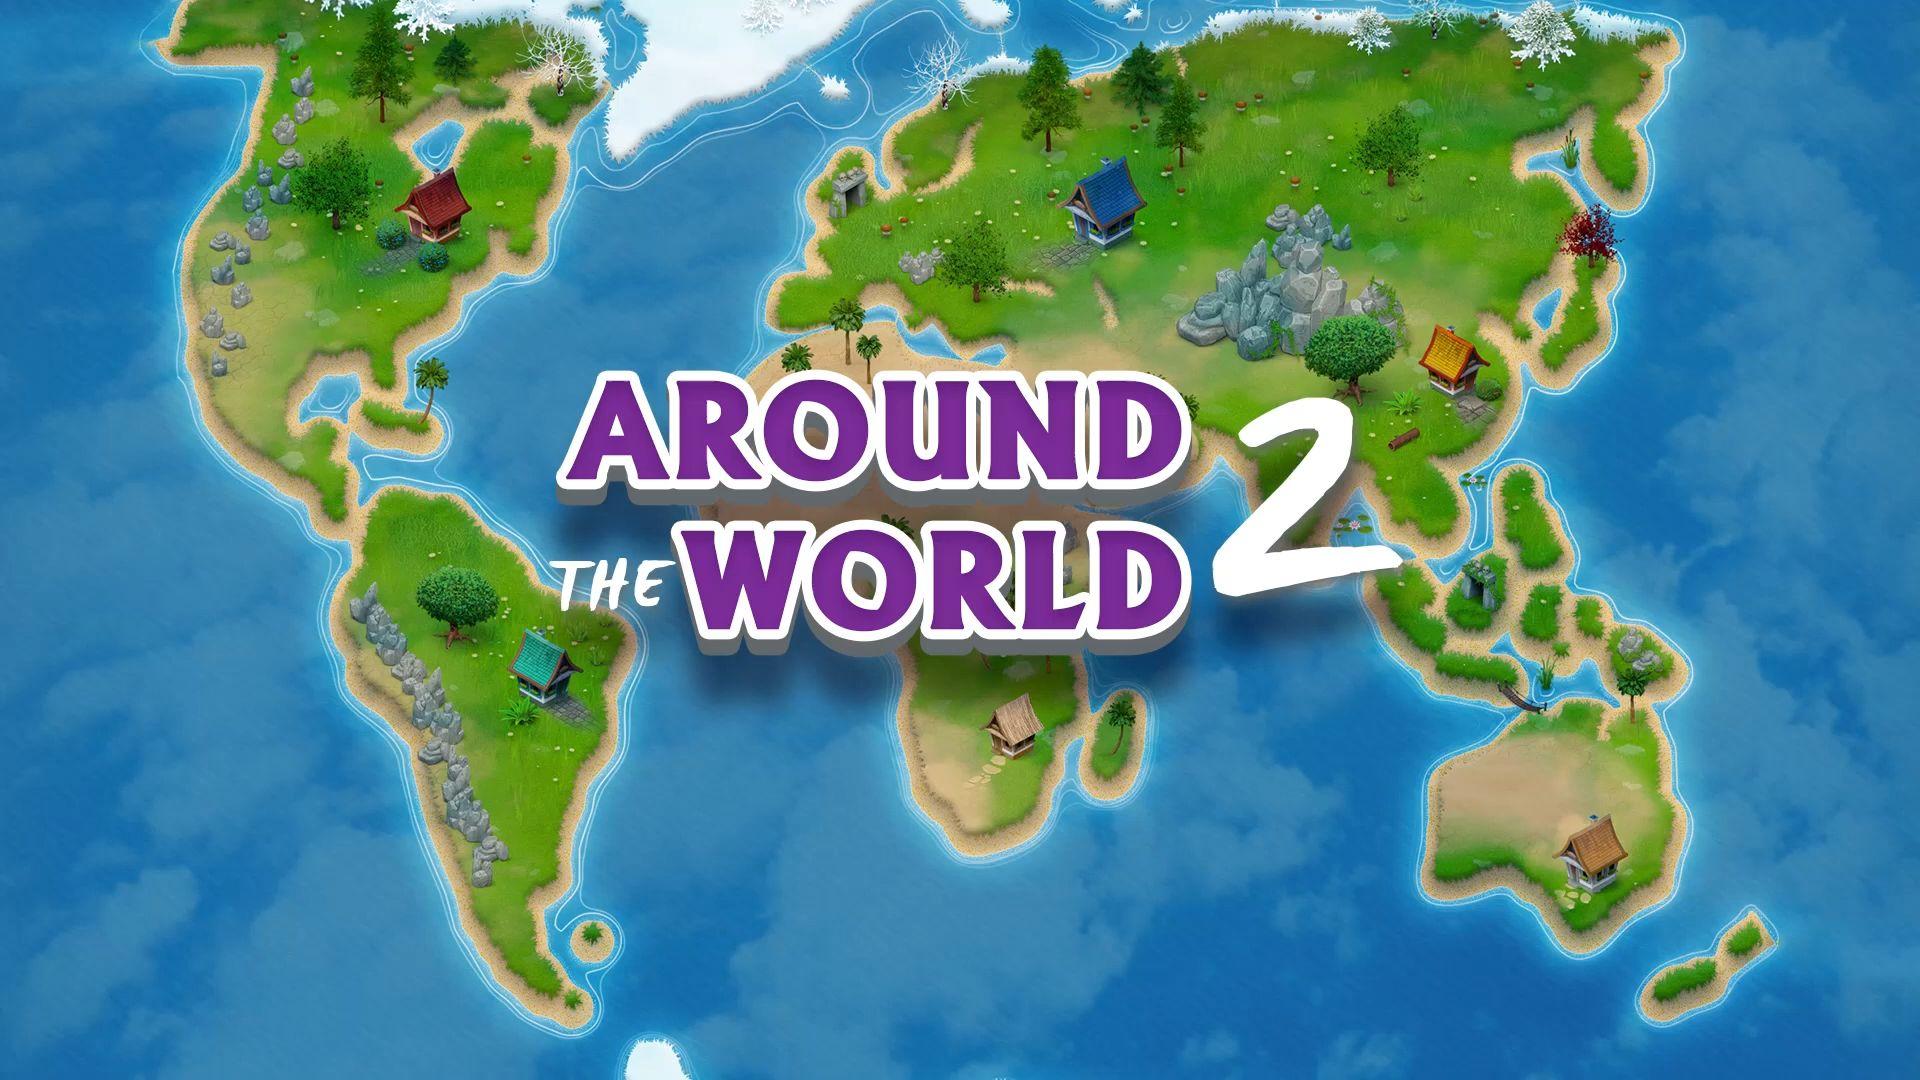 Around the world 2: Hidden Objects captura de pantalla 1